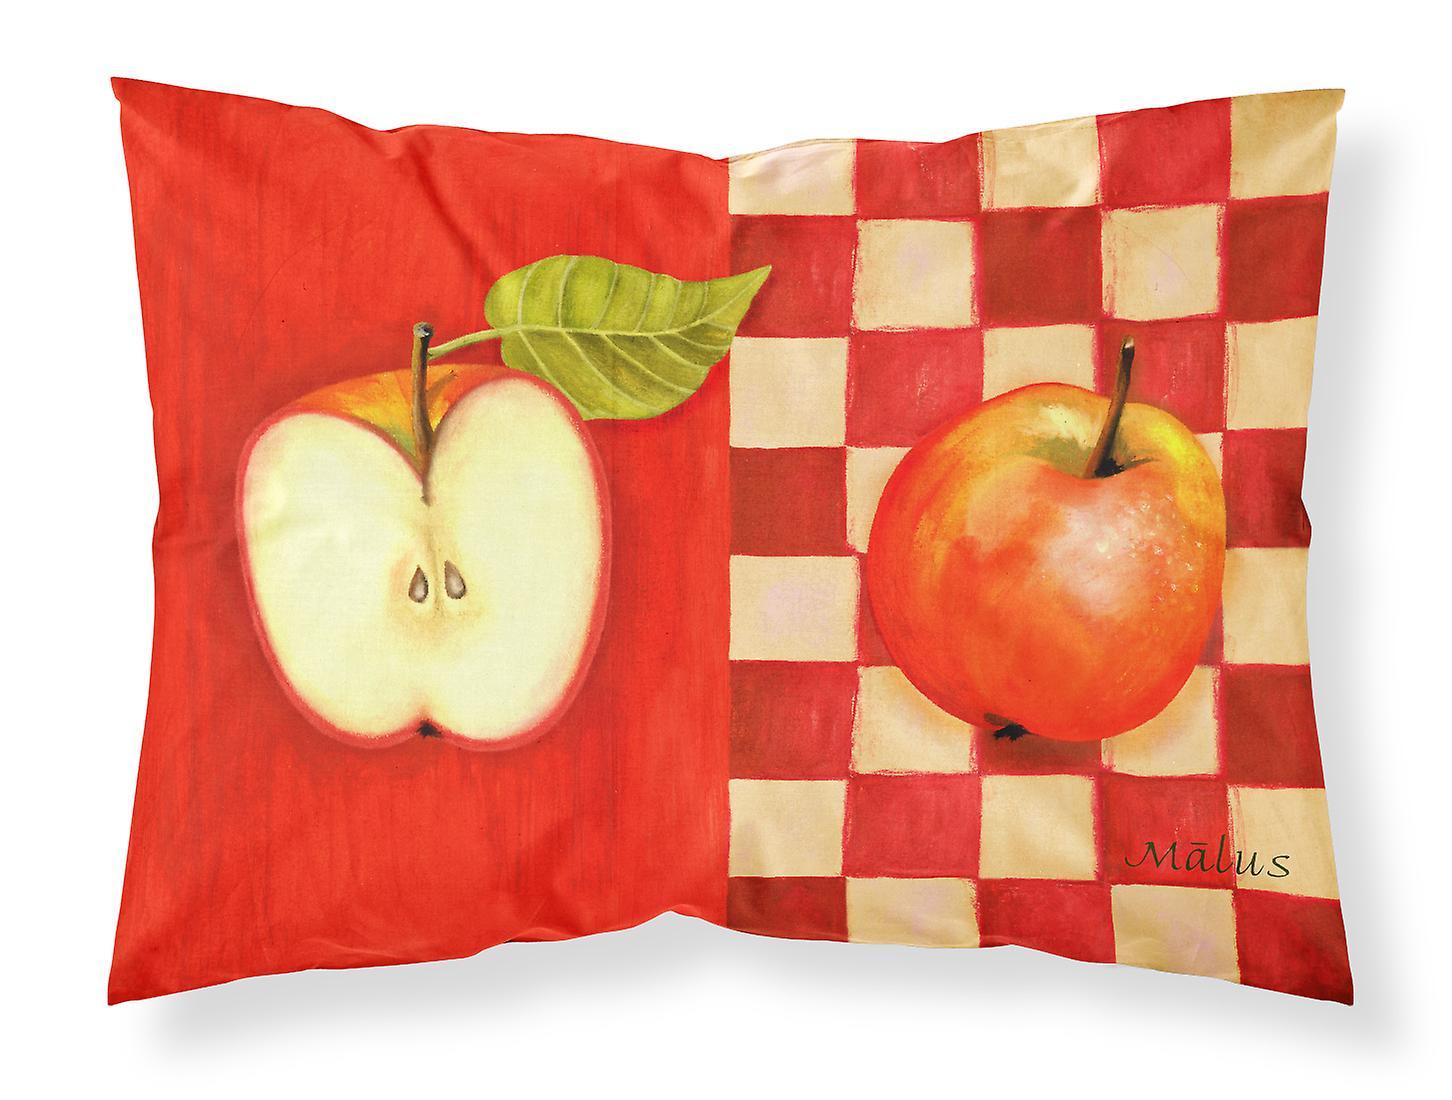 D'oreiller Nuhn Ute Apple Tissu Taie Standard Par TFulJc3K1